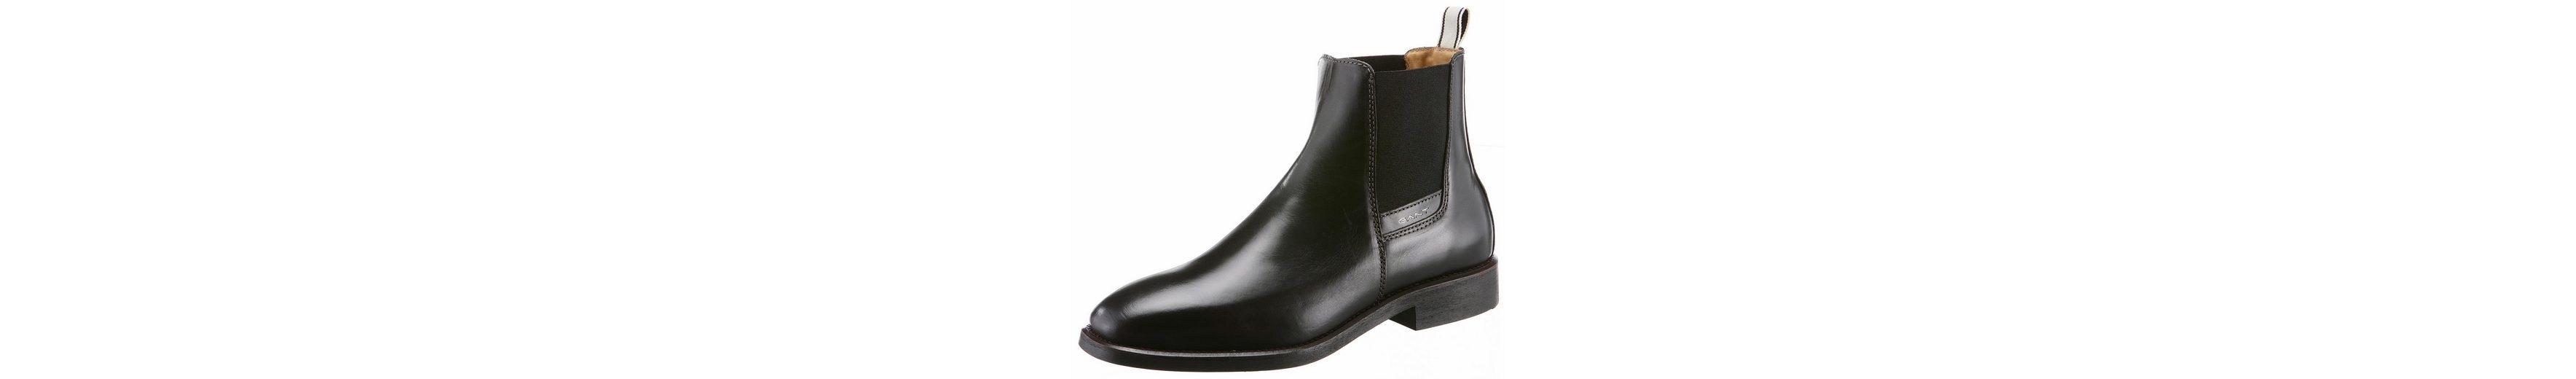 Gant Footwear James Chelseaboots, mit gepolsterter Innensohle